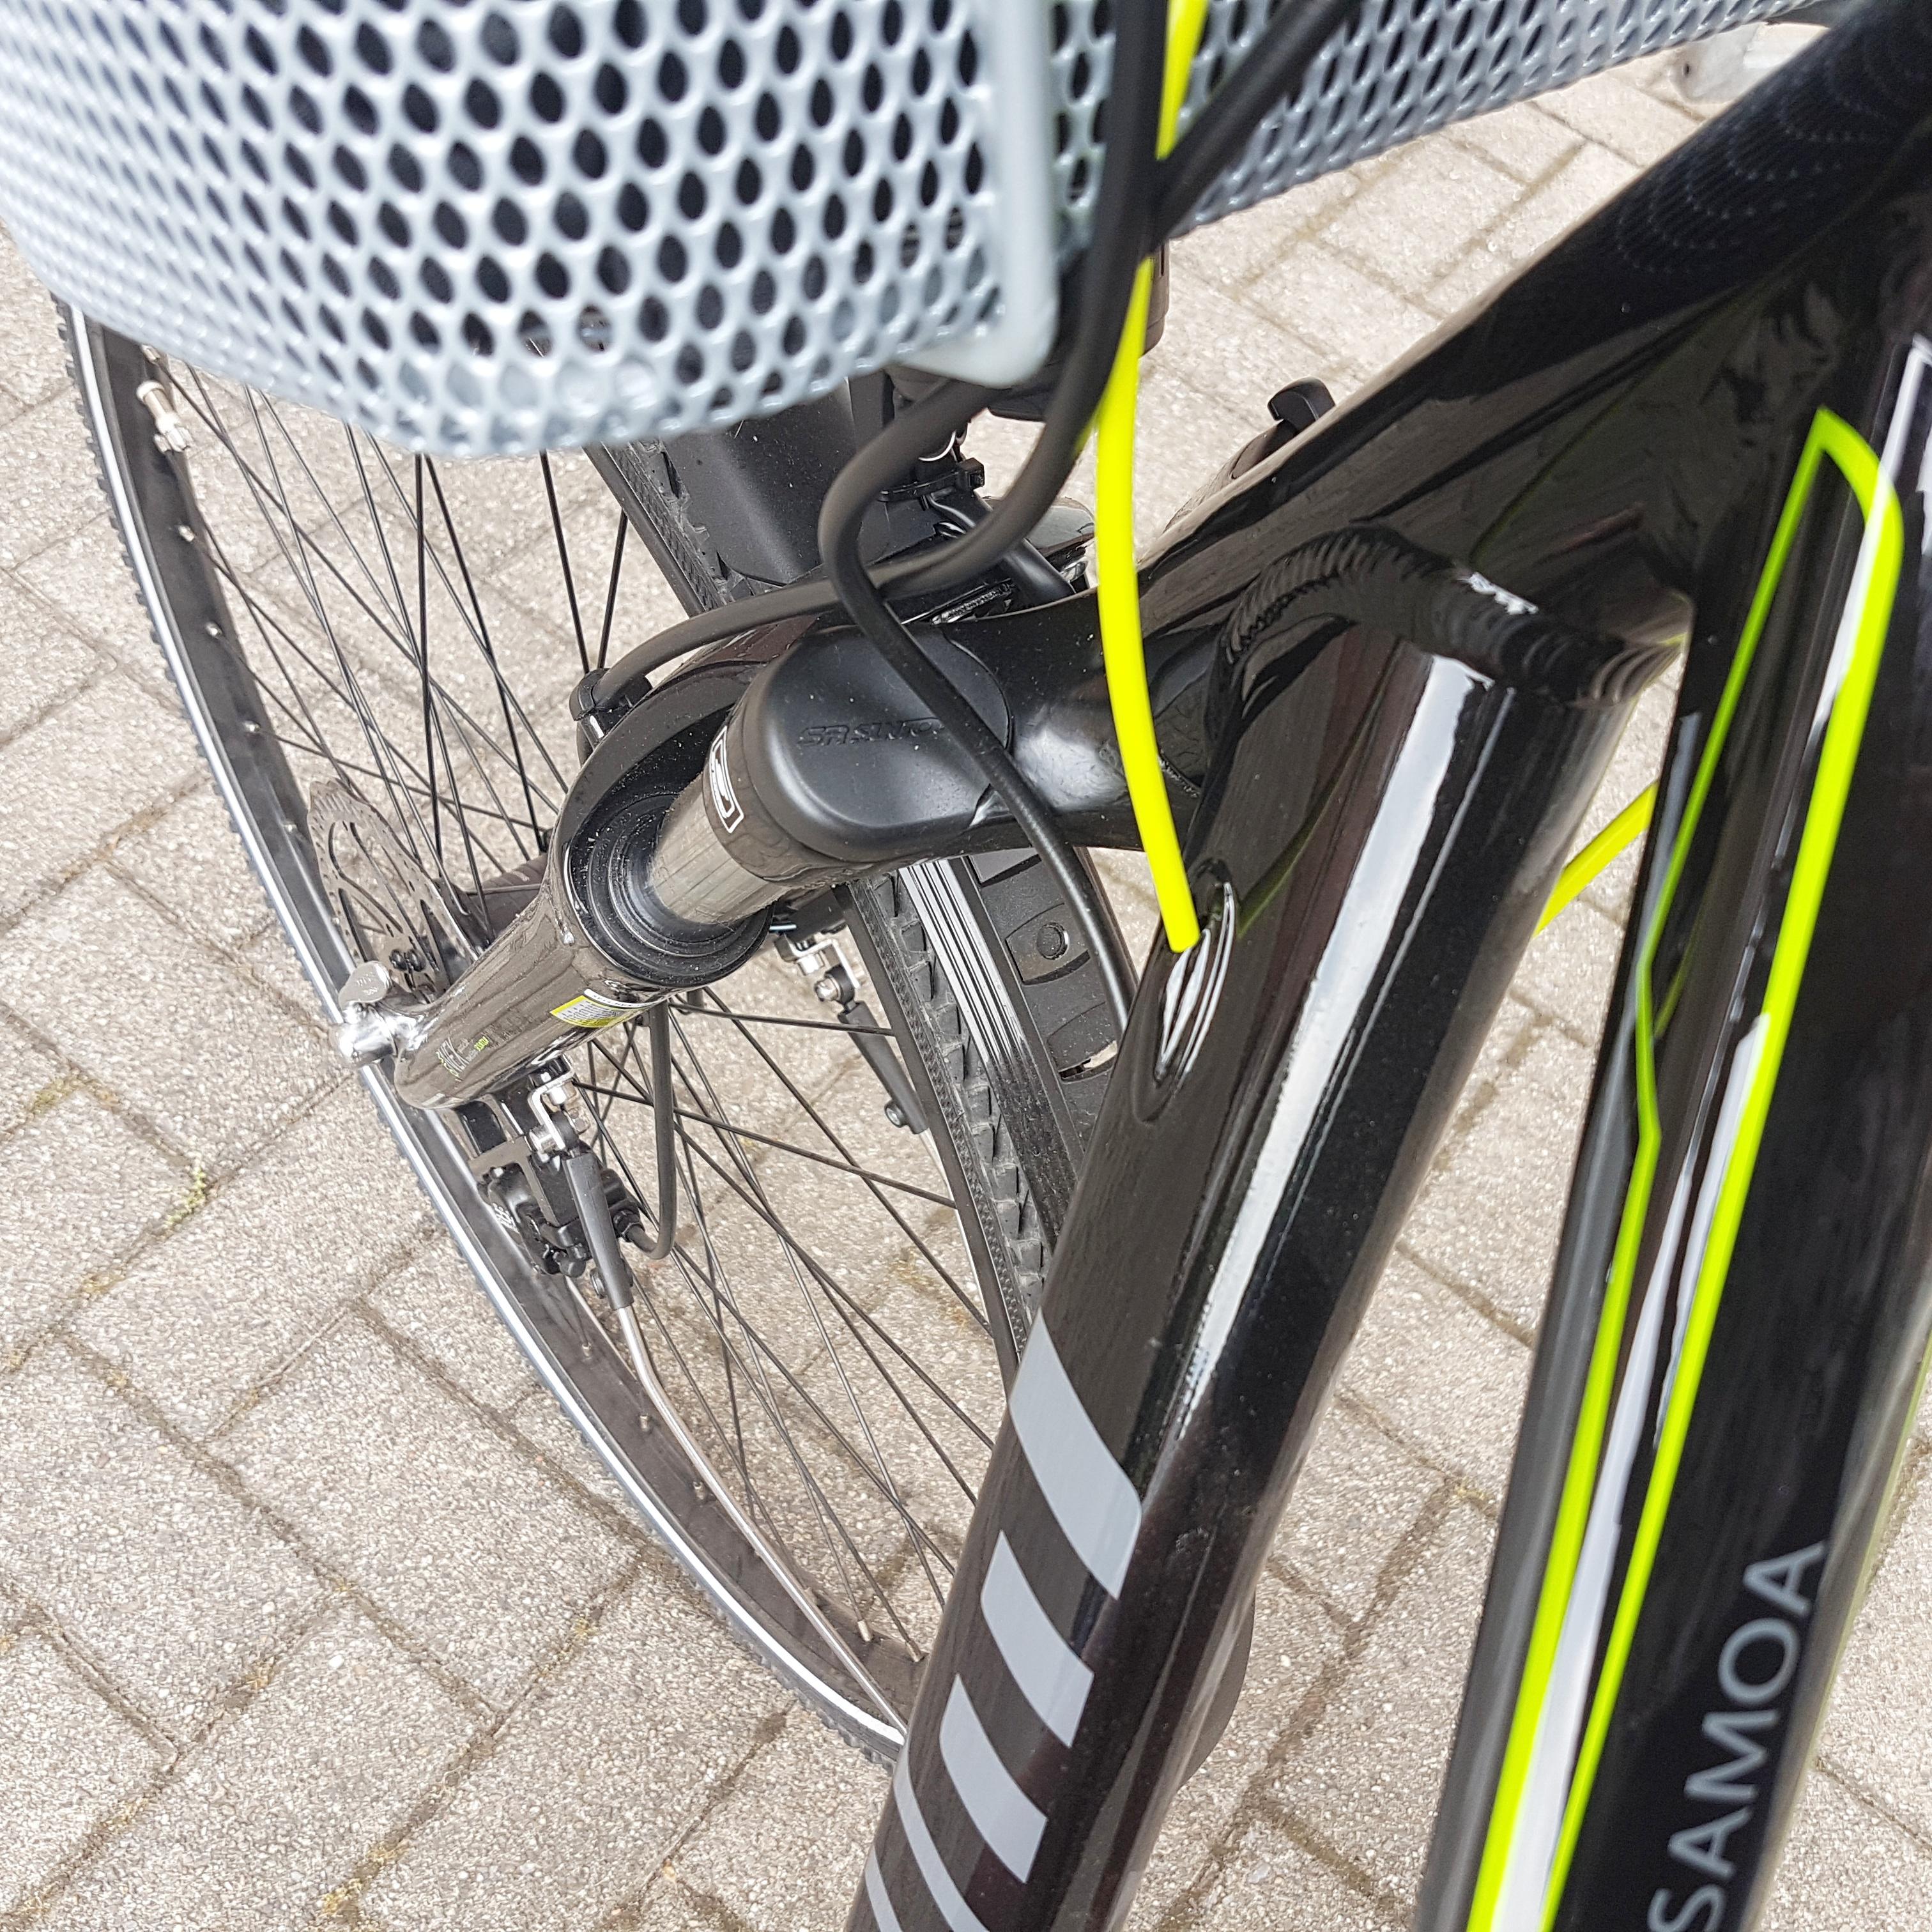 Wochenrückblick 24/ 2017 - Fahrradtour